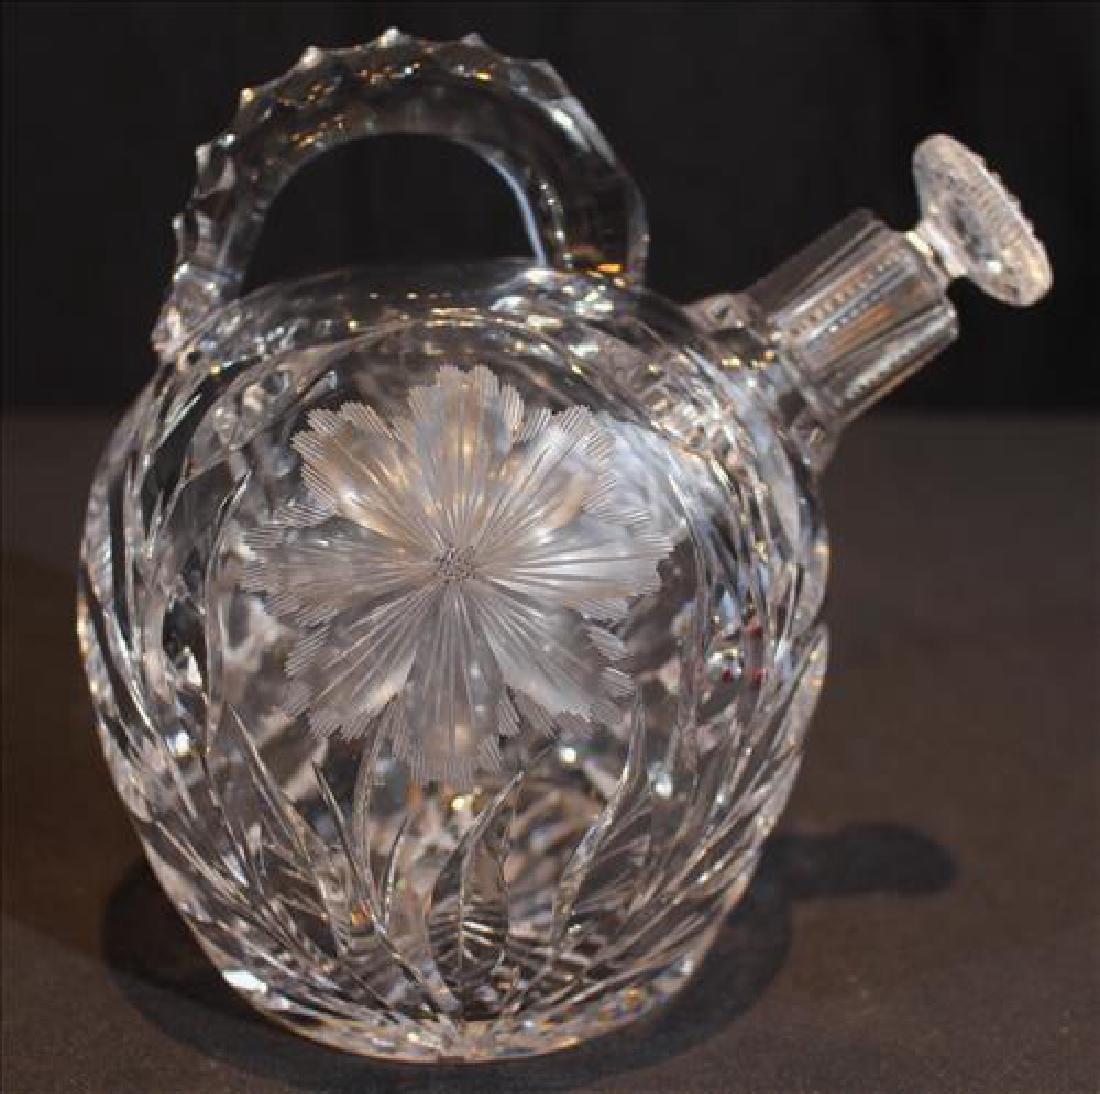 Cut glass crystal liquor jug or decanter with cut